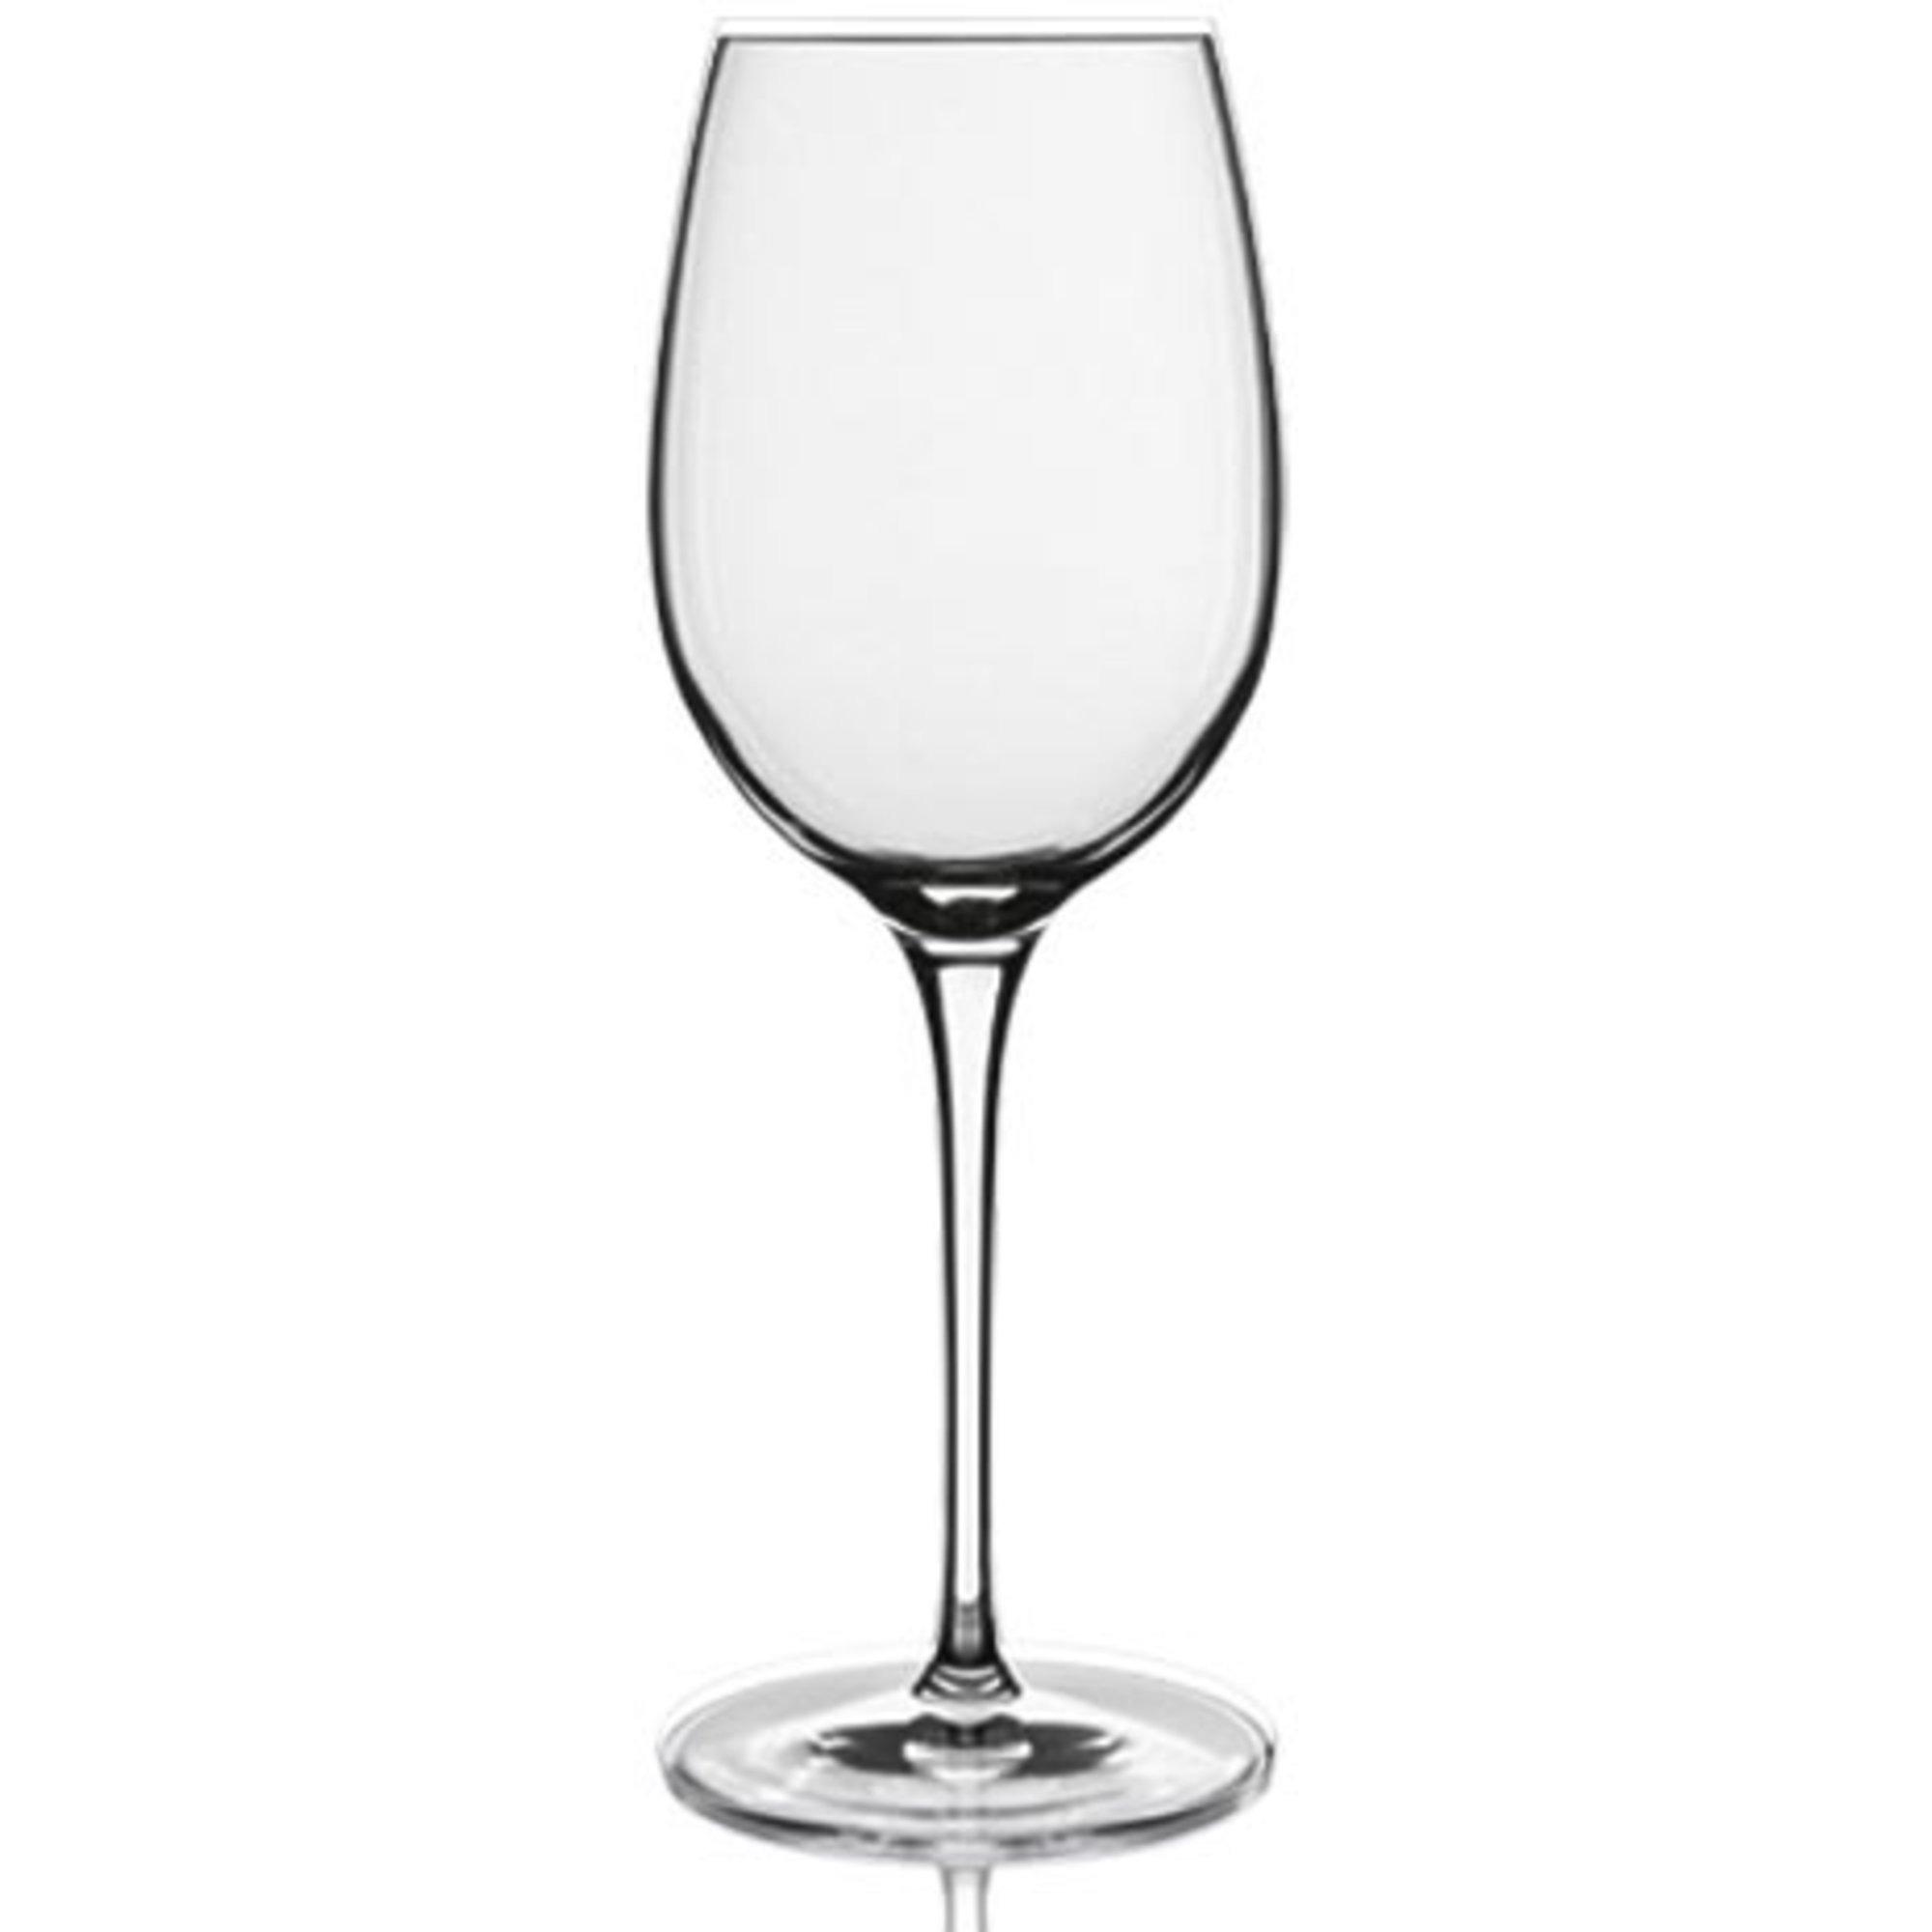 Luigi Bormioli Accademia Vinoteque 2 st. Fragrante Vitvinsglas